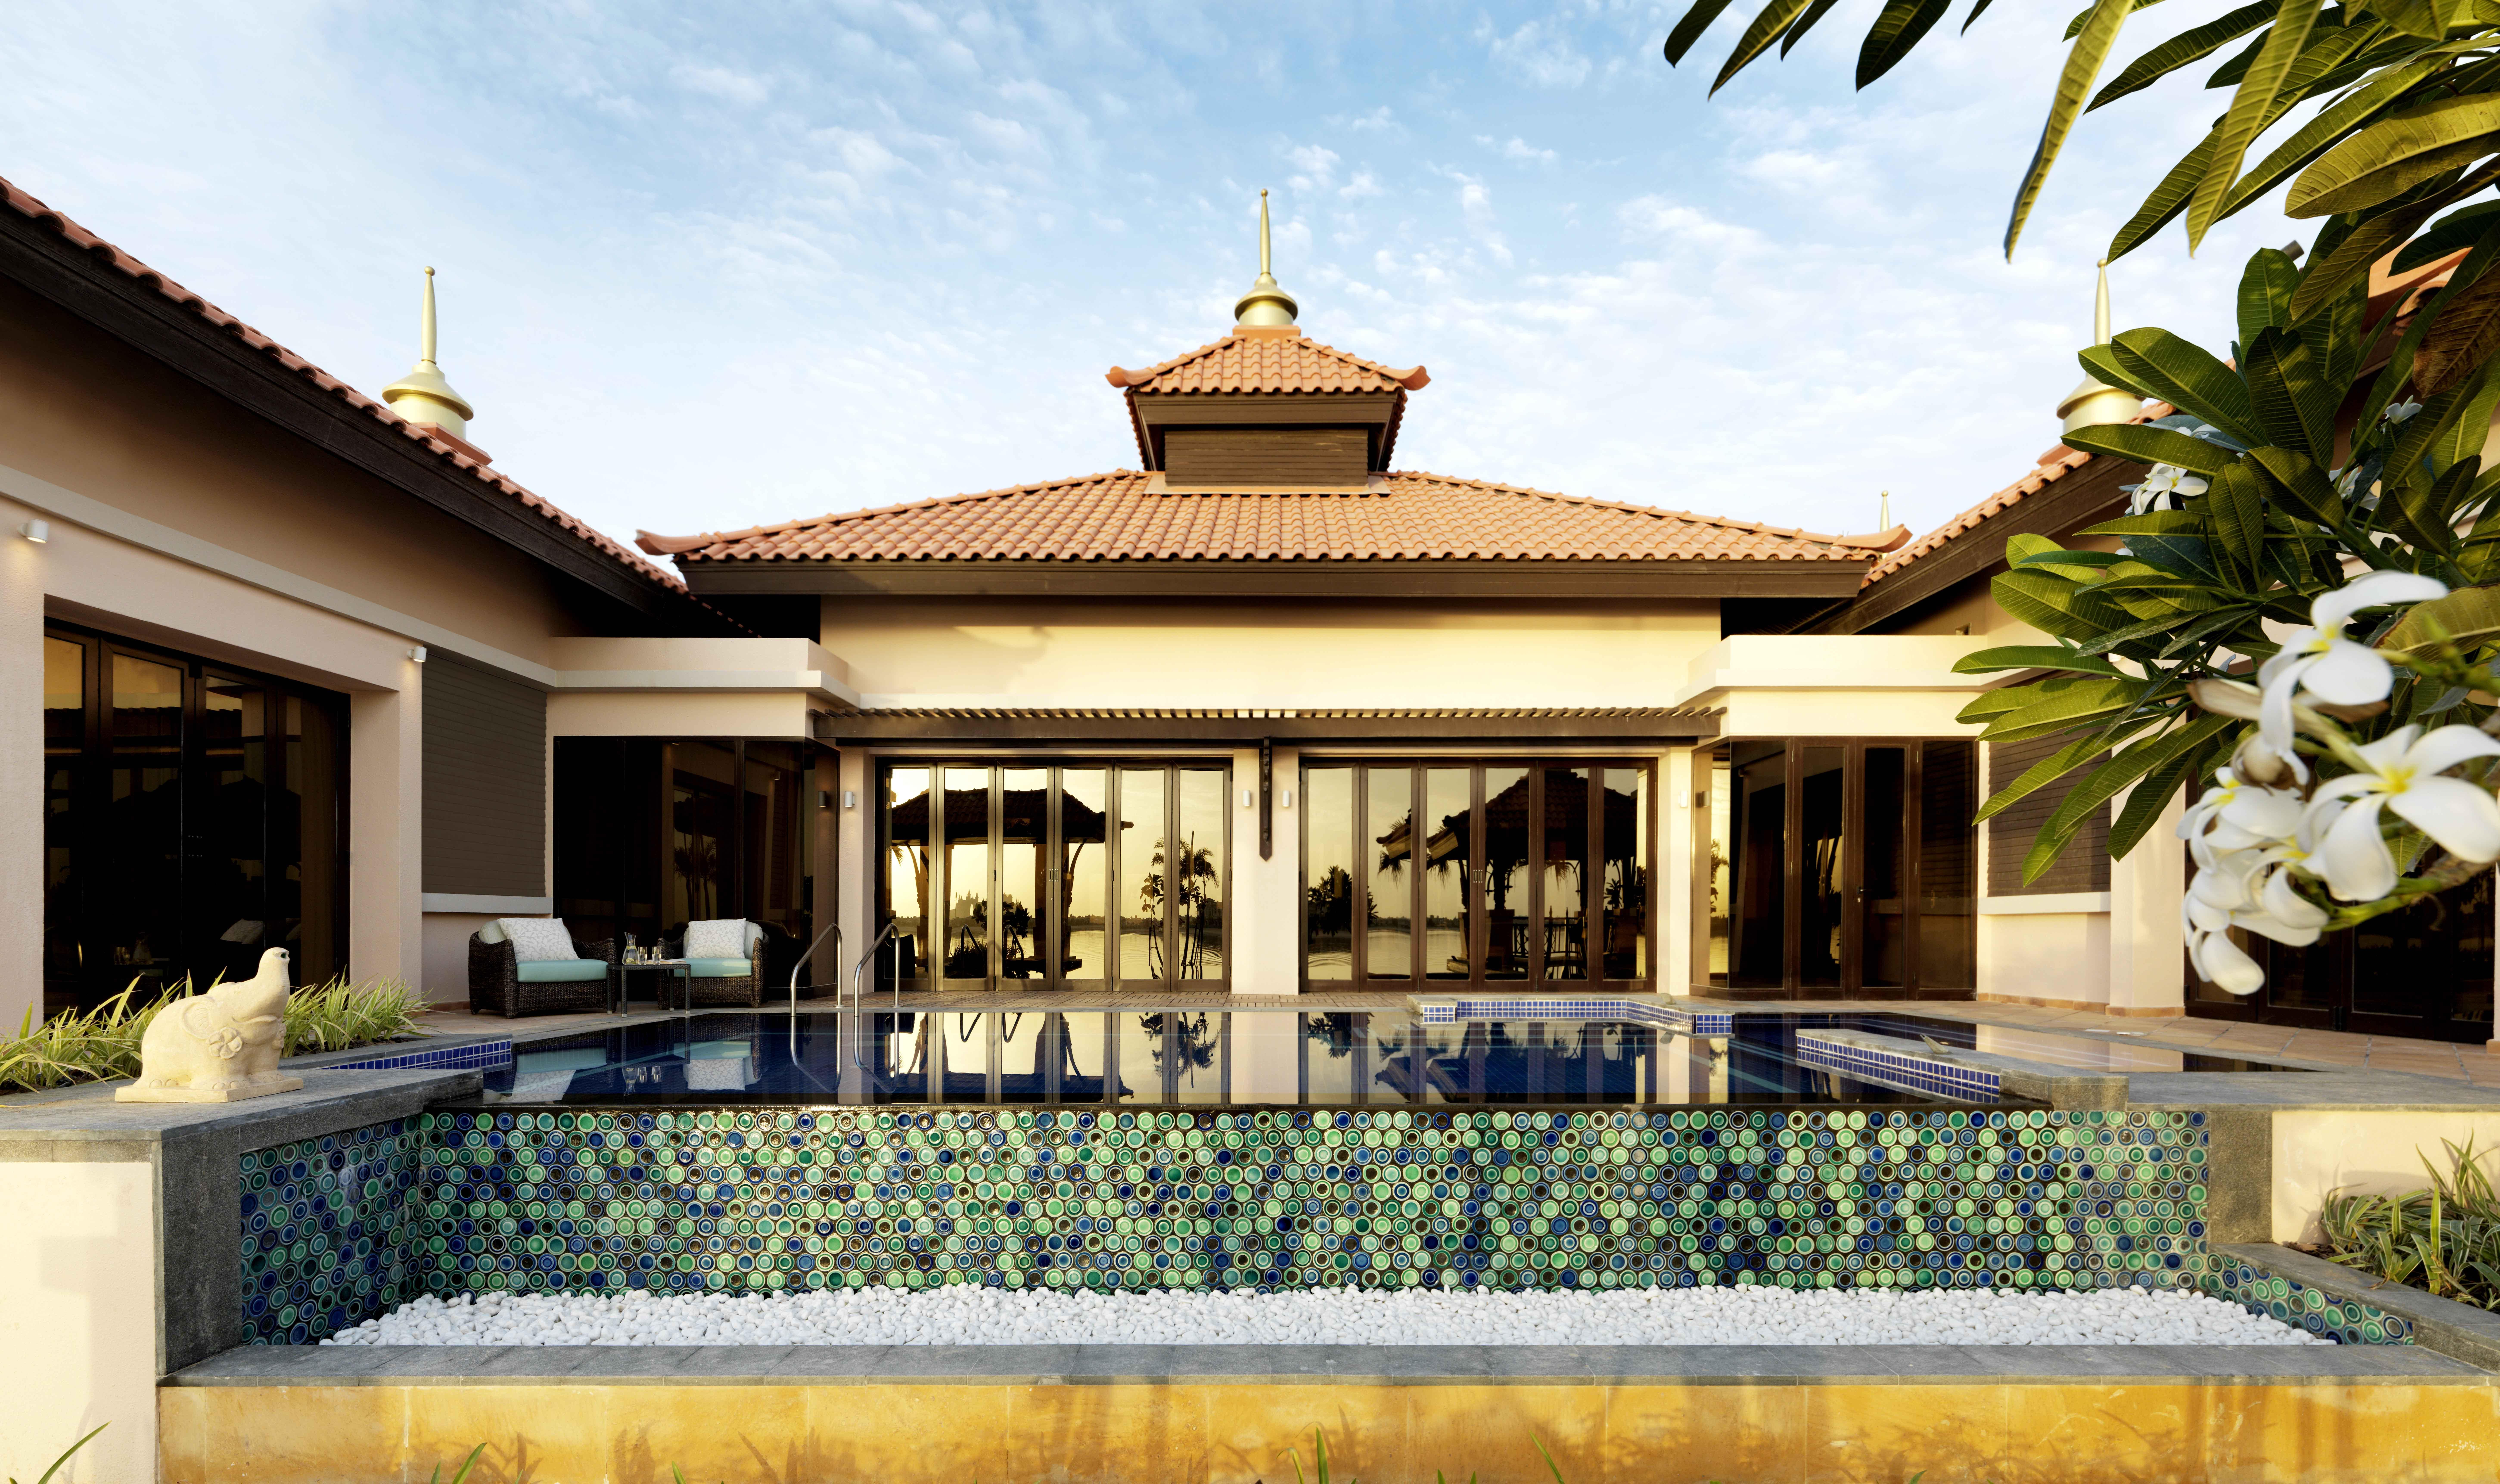 anantara-the-palm-luxury-beach-villa